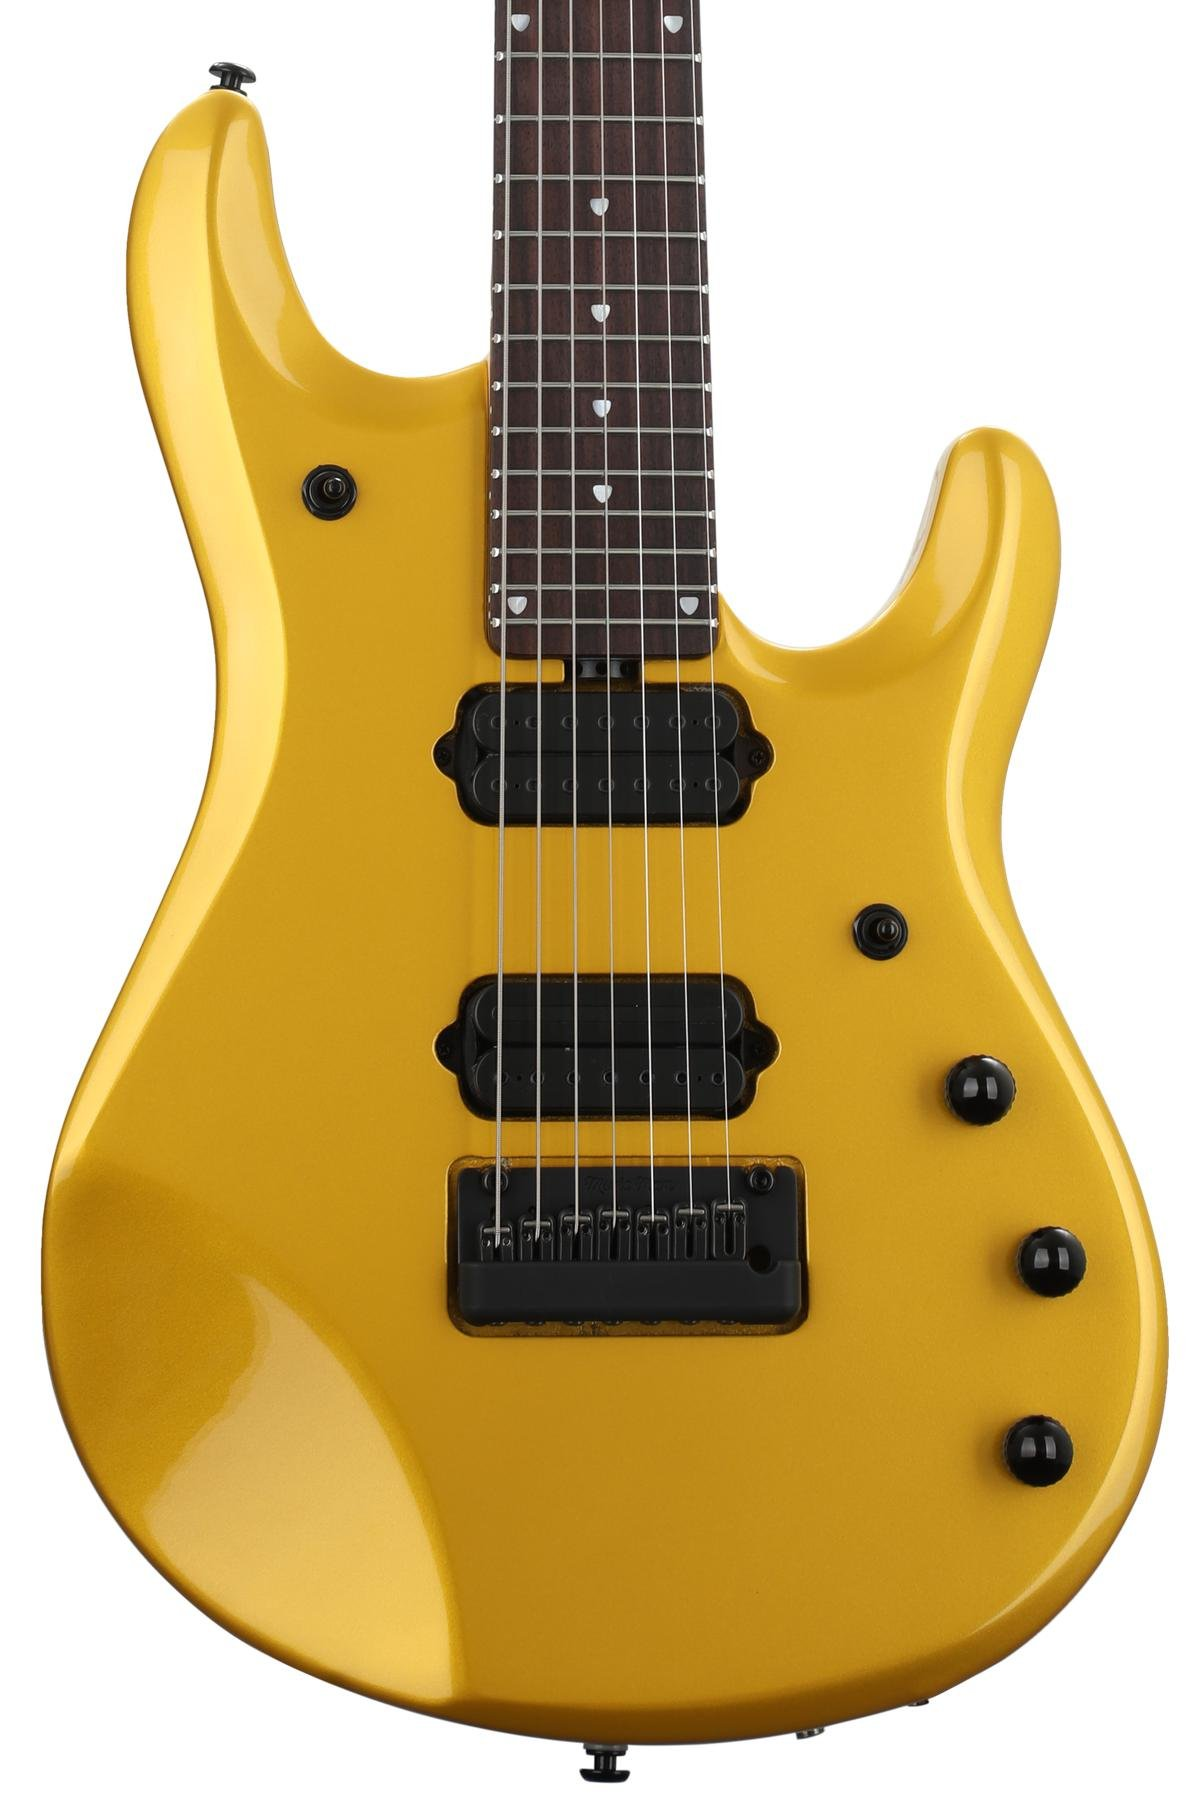 Ernie Ball Music Man John Petrucci 7 with Piezo - Firemist Gold